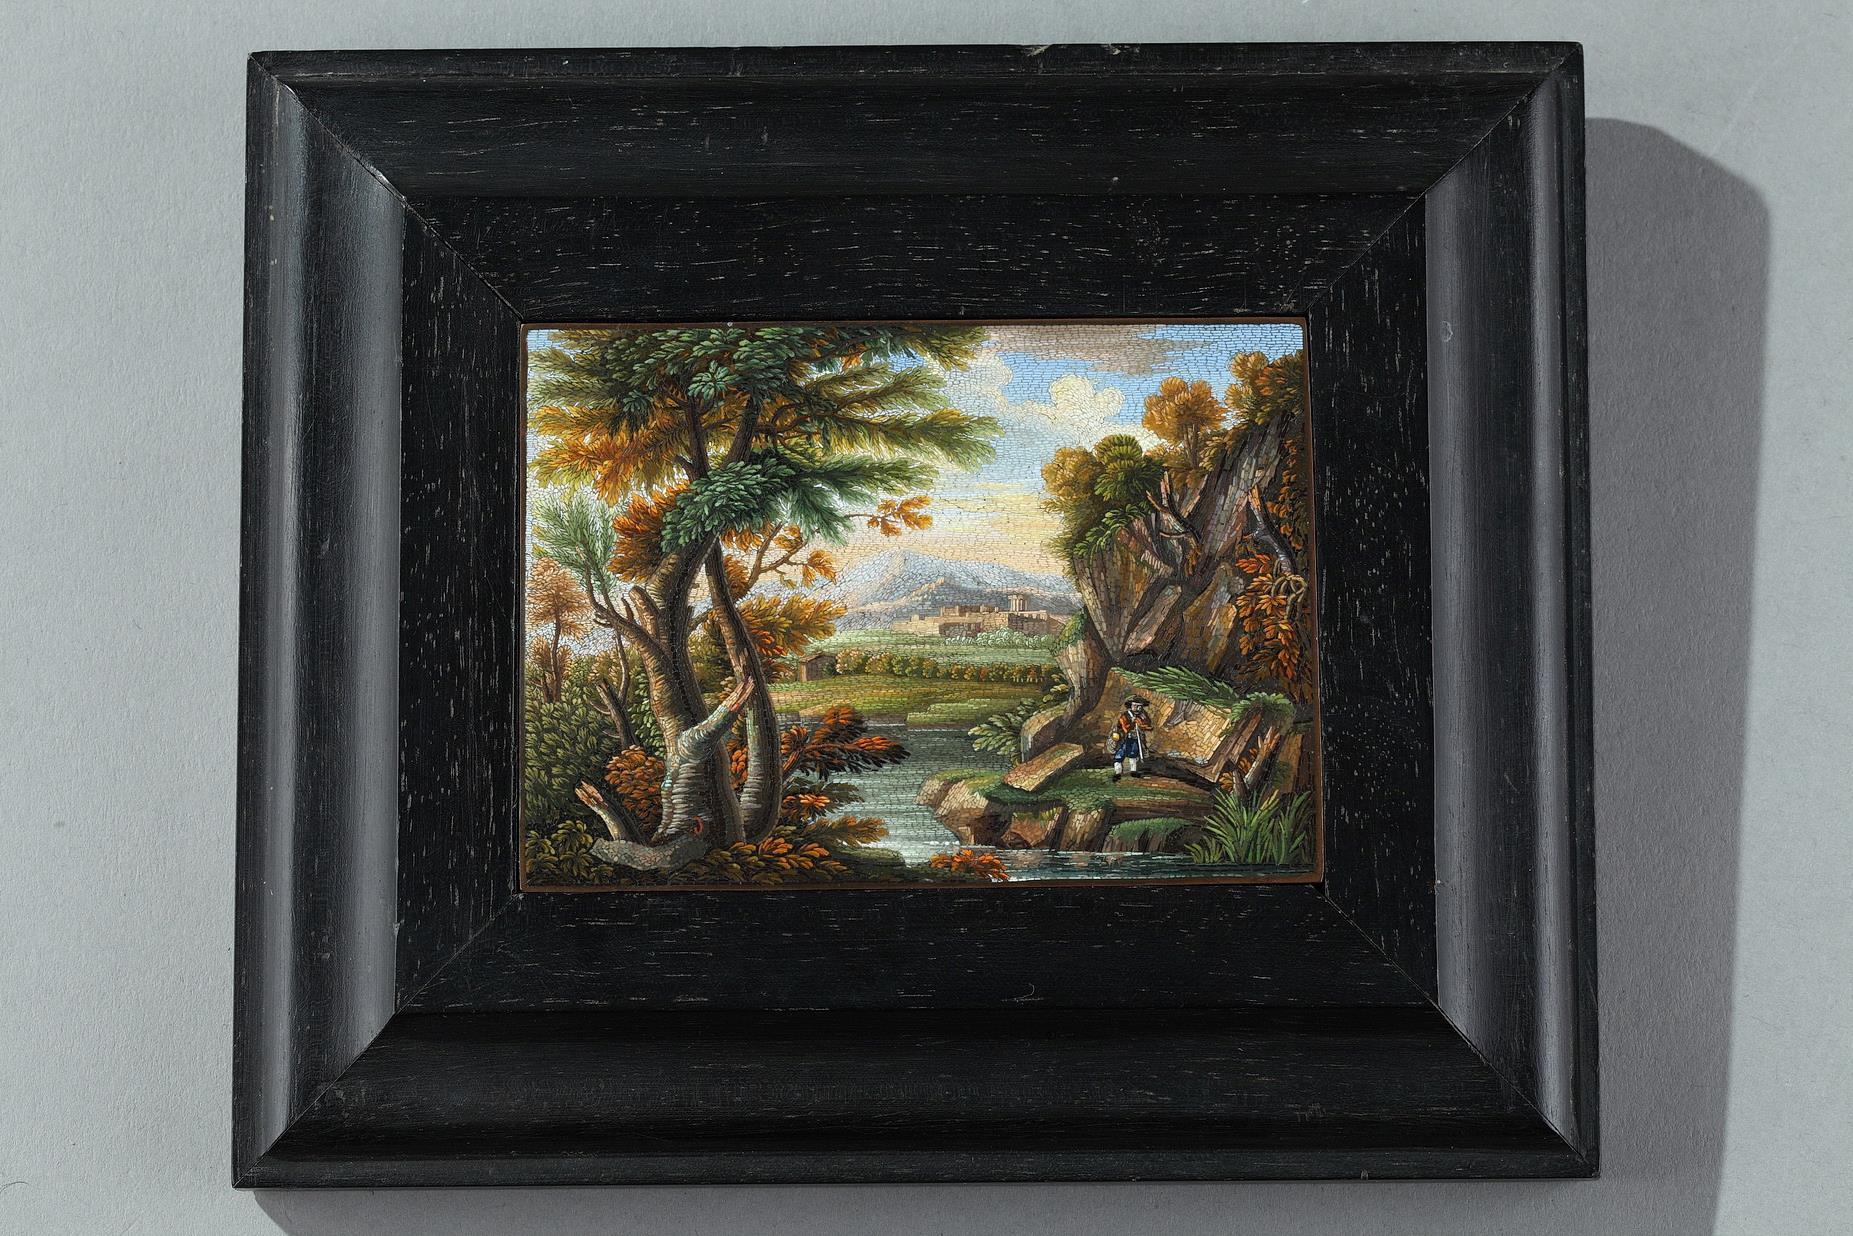 Micromosaic plaque with river landscape. Circa 1820.